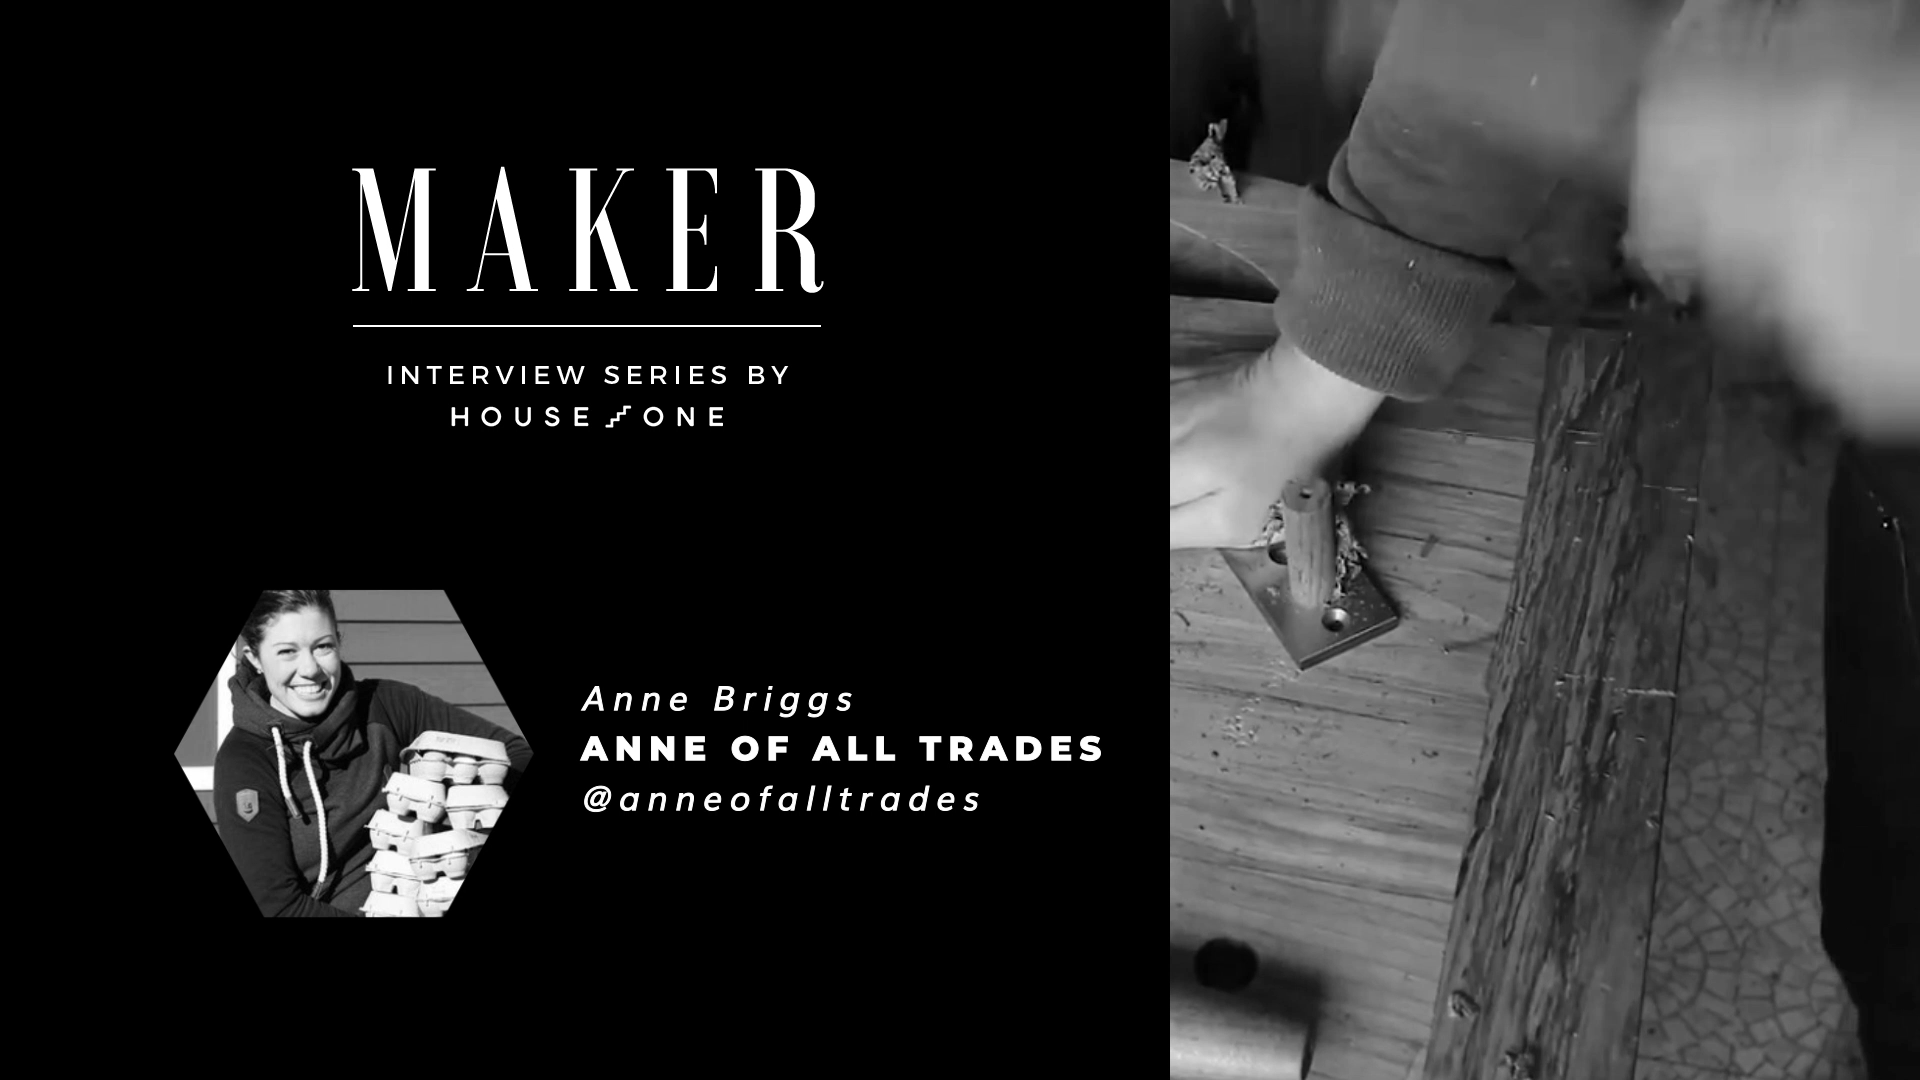 Anne Briggs of All Trades.